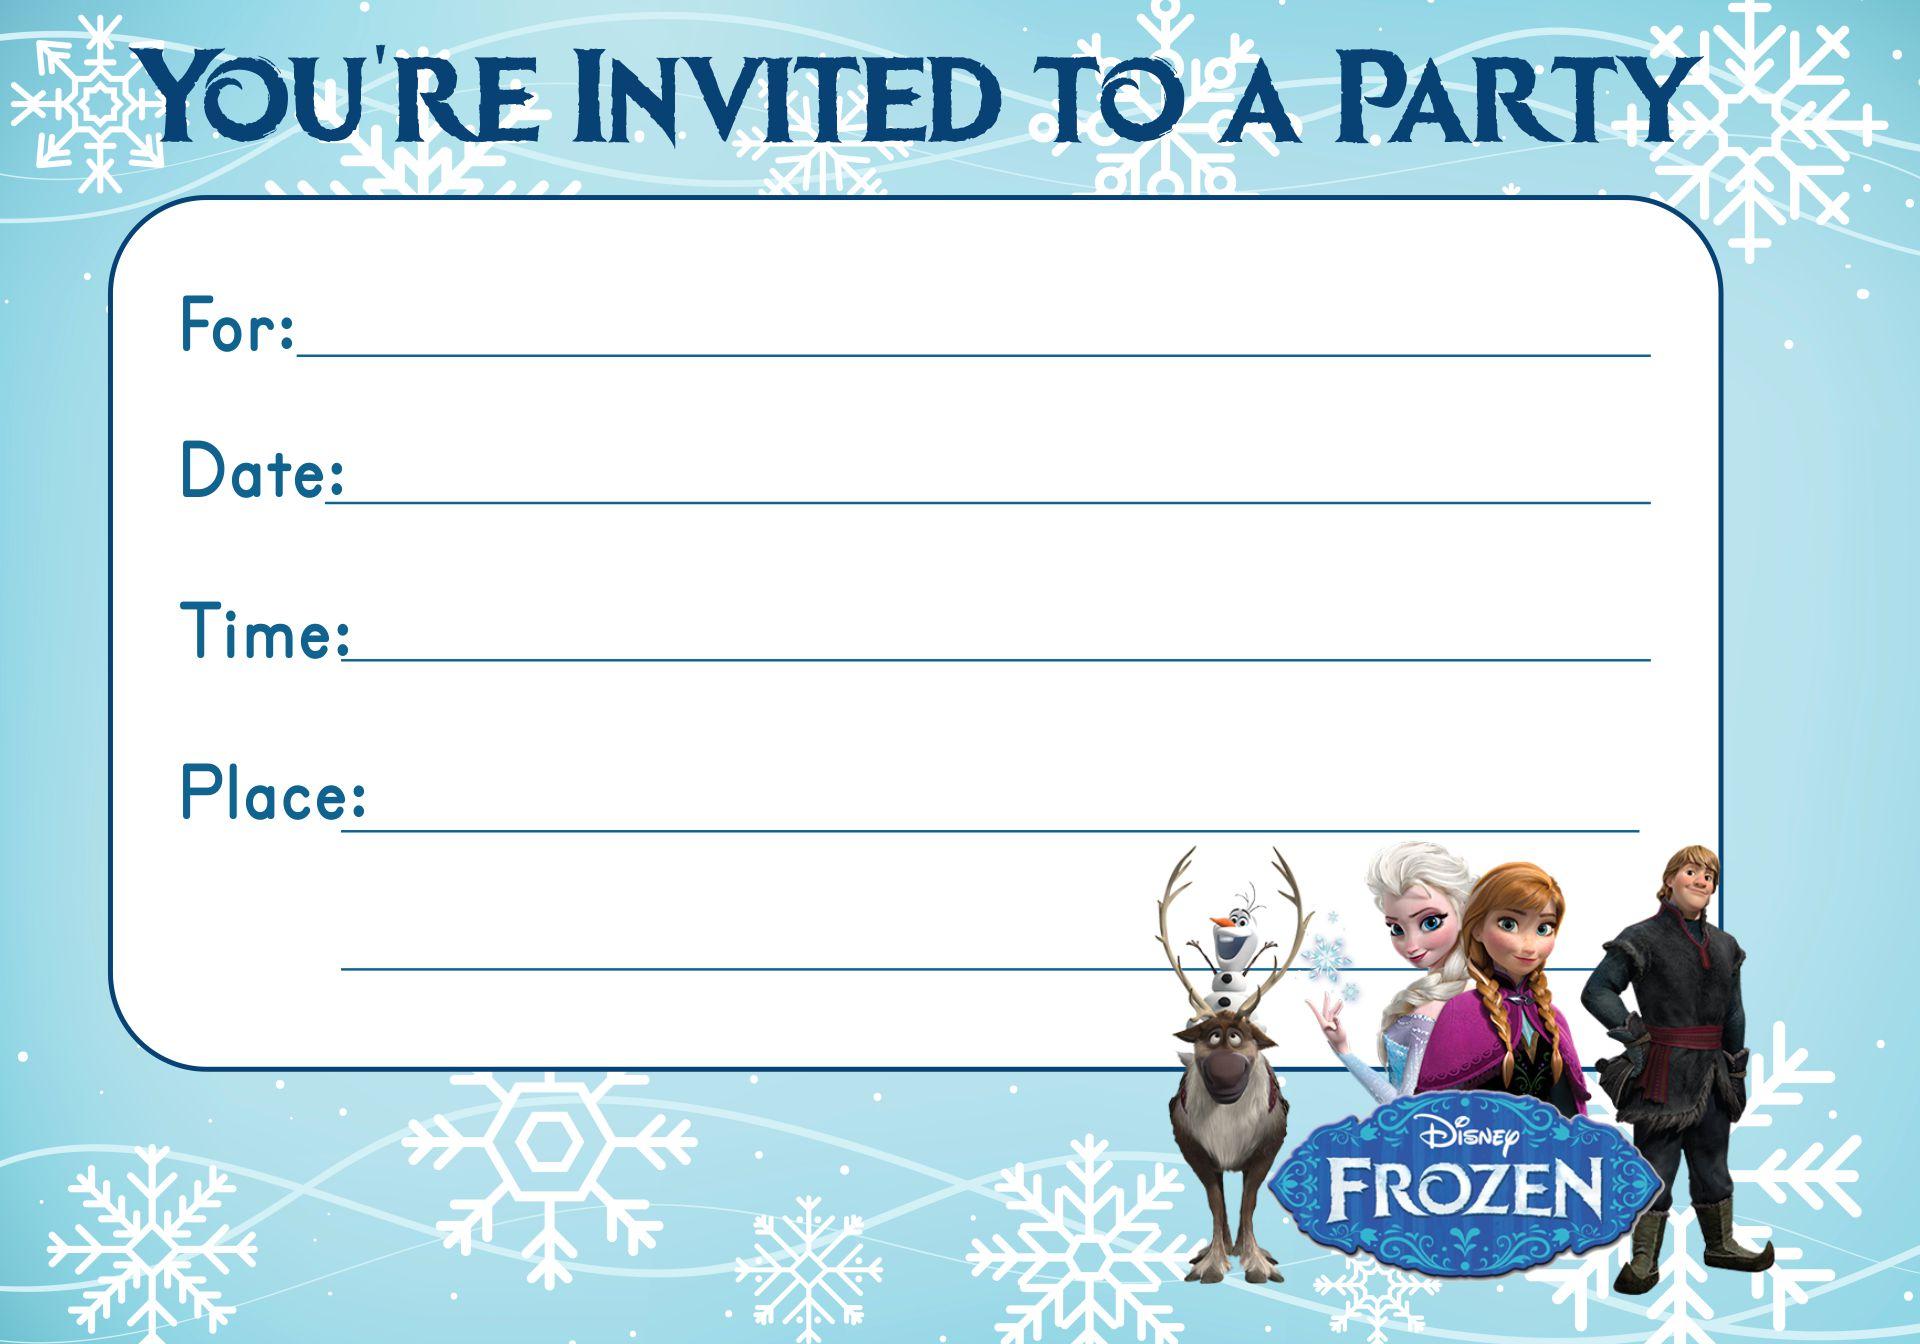 Disney Frozen Party Invitations Editable